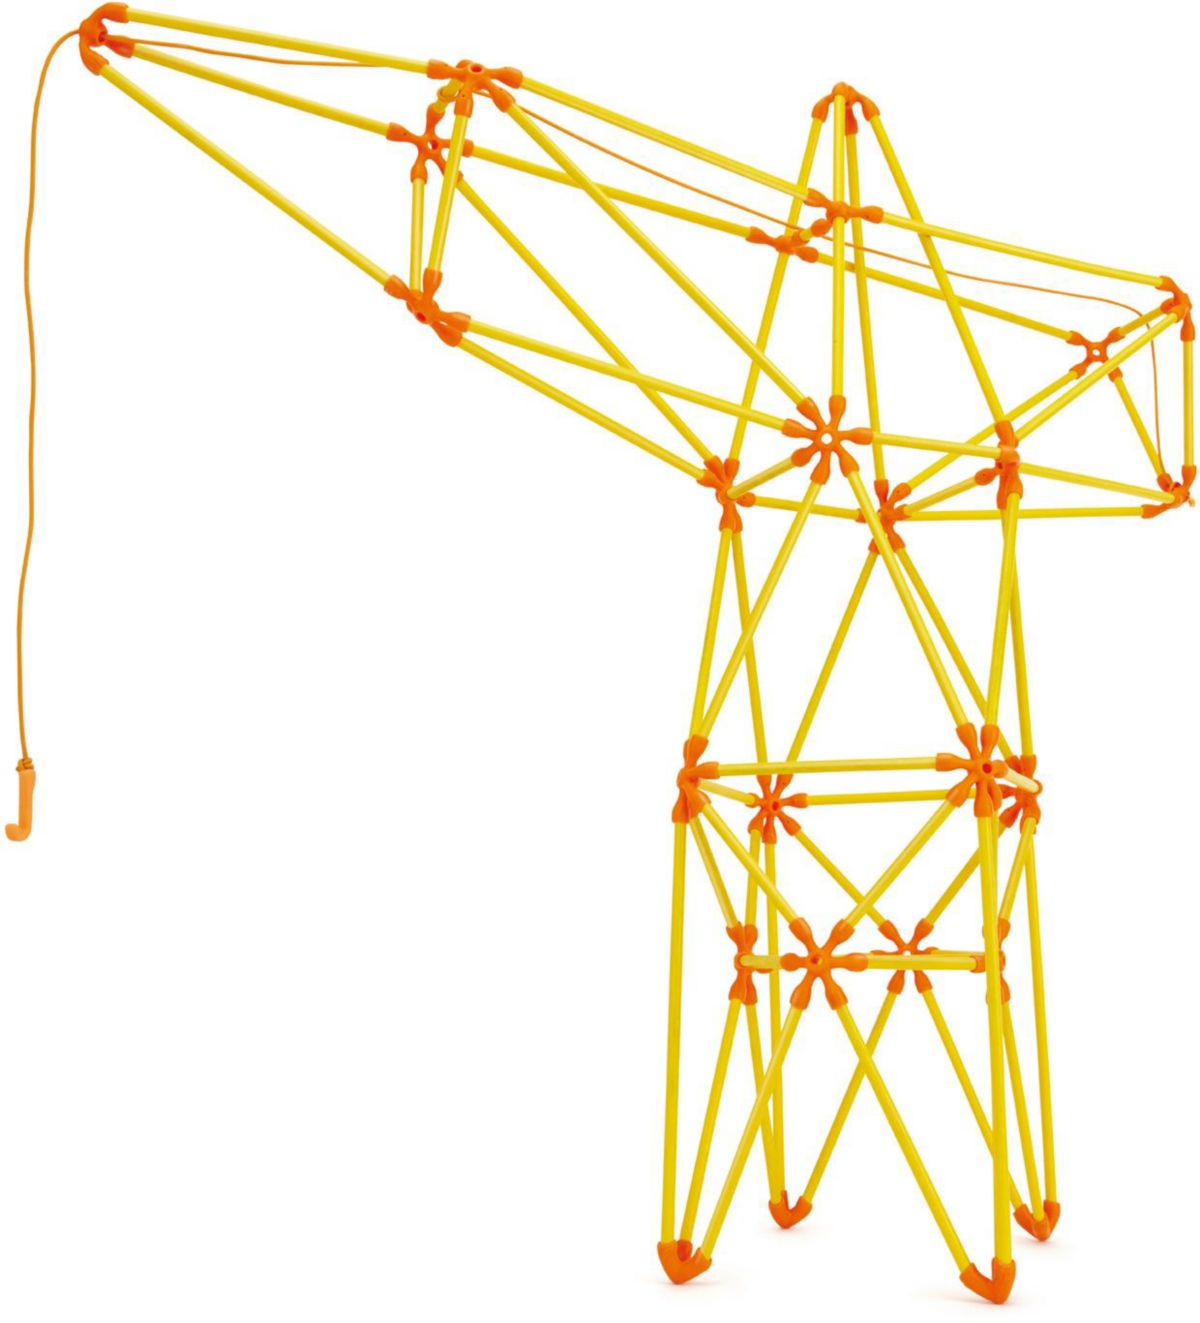 Hape Konstruktionsspielzeug, »Auslegerkran«